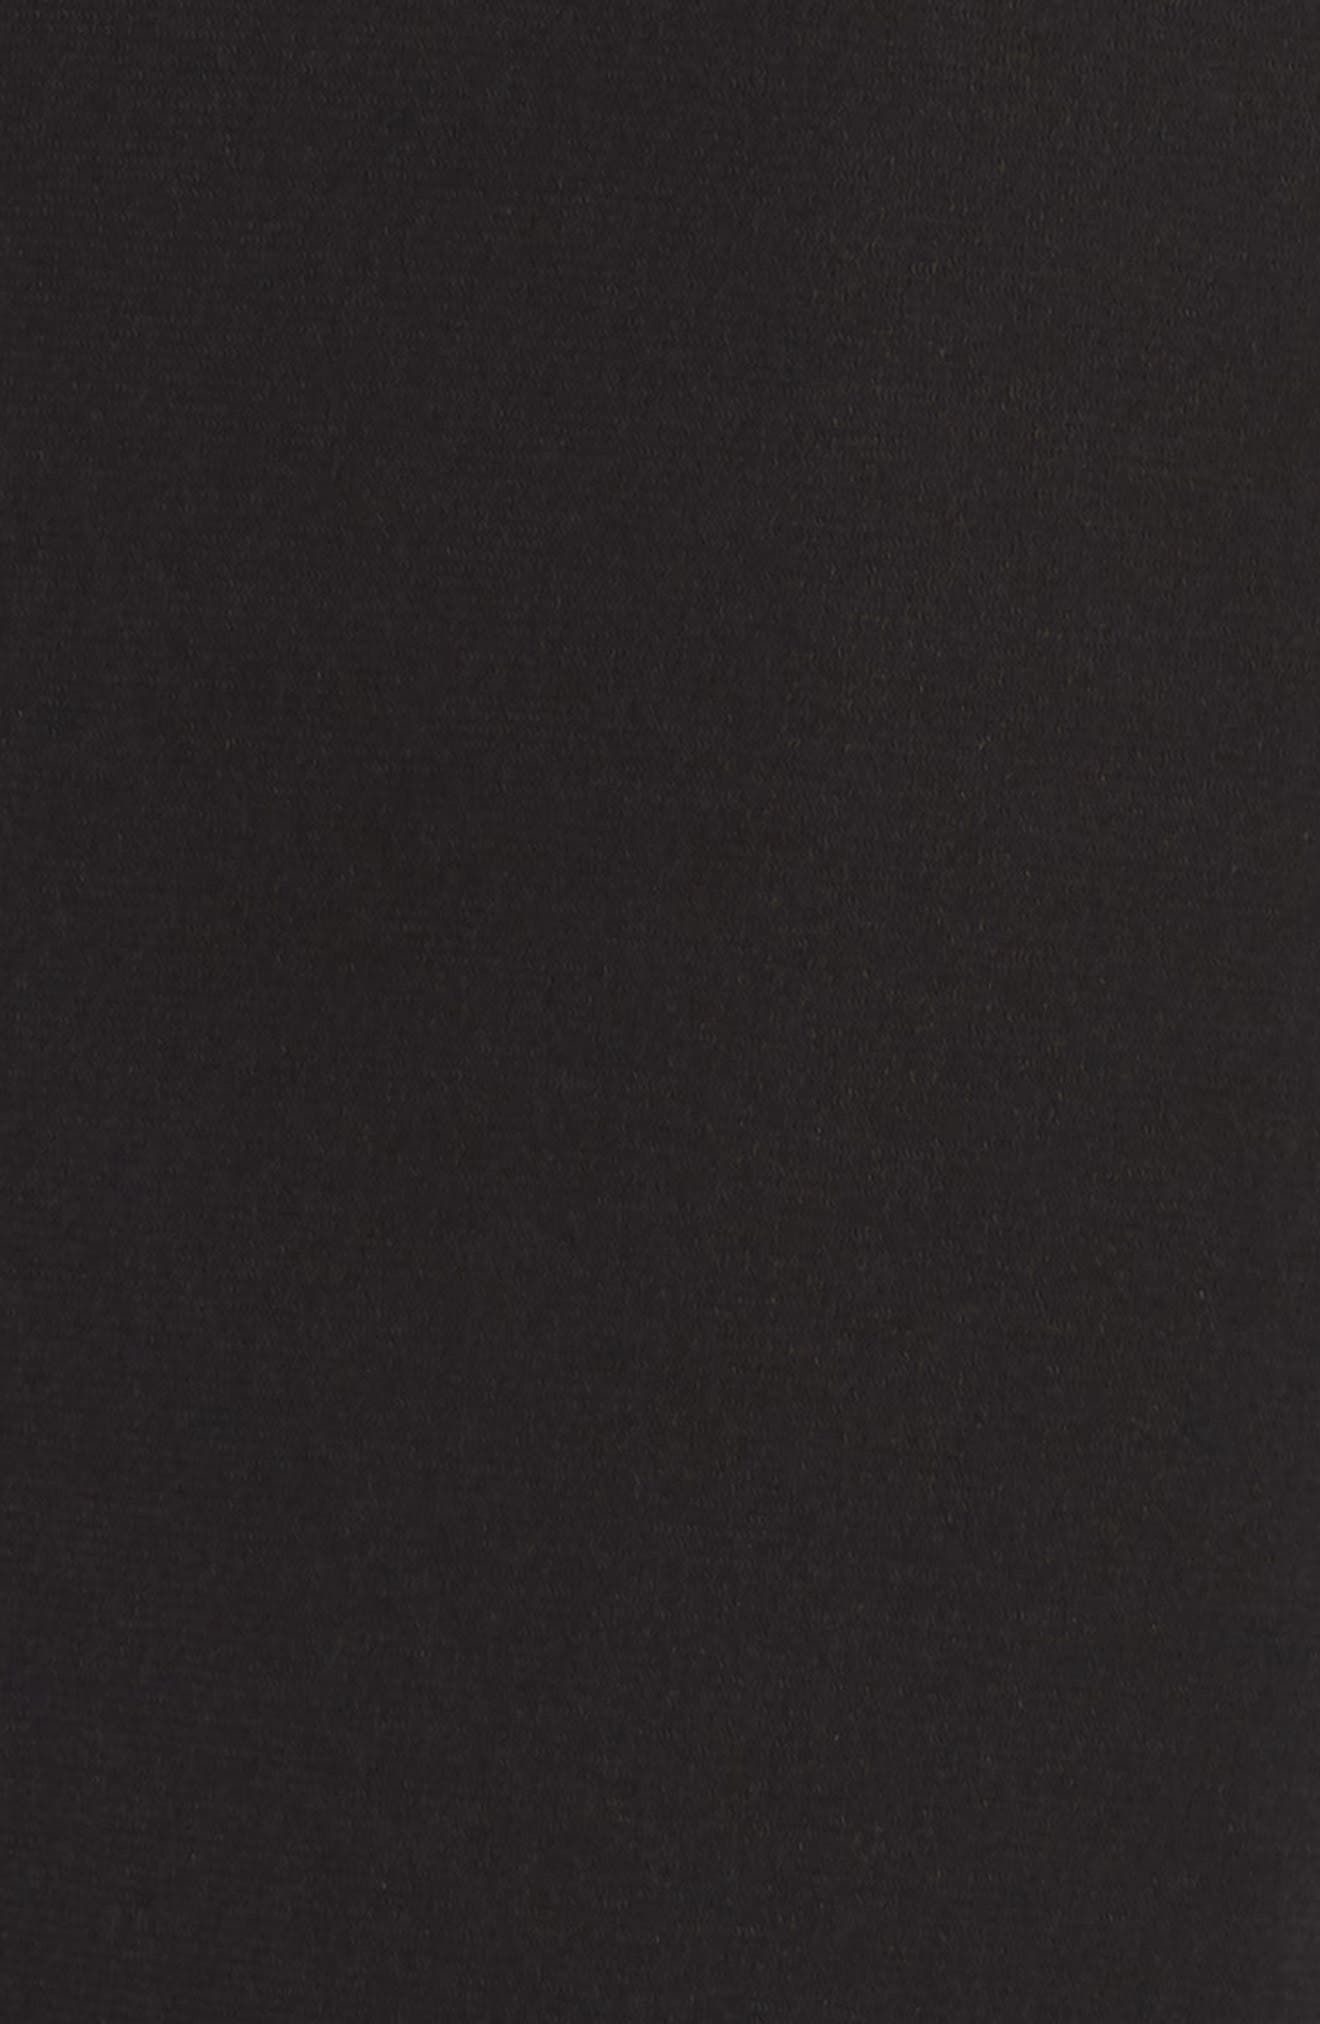 Deep V-Neck Skater Dress,                             Alternate thumbnail 6, color,                             BLACK/ / NUDE/ SILVER